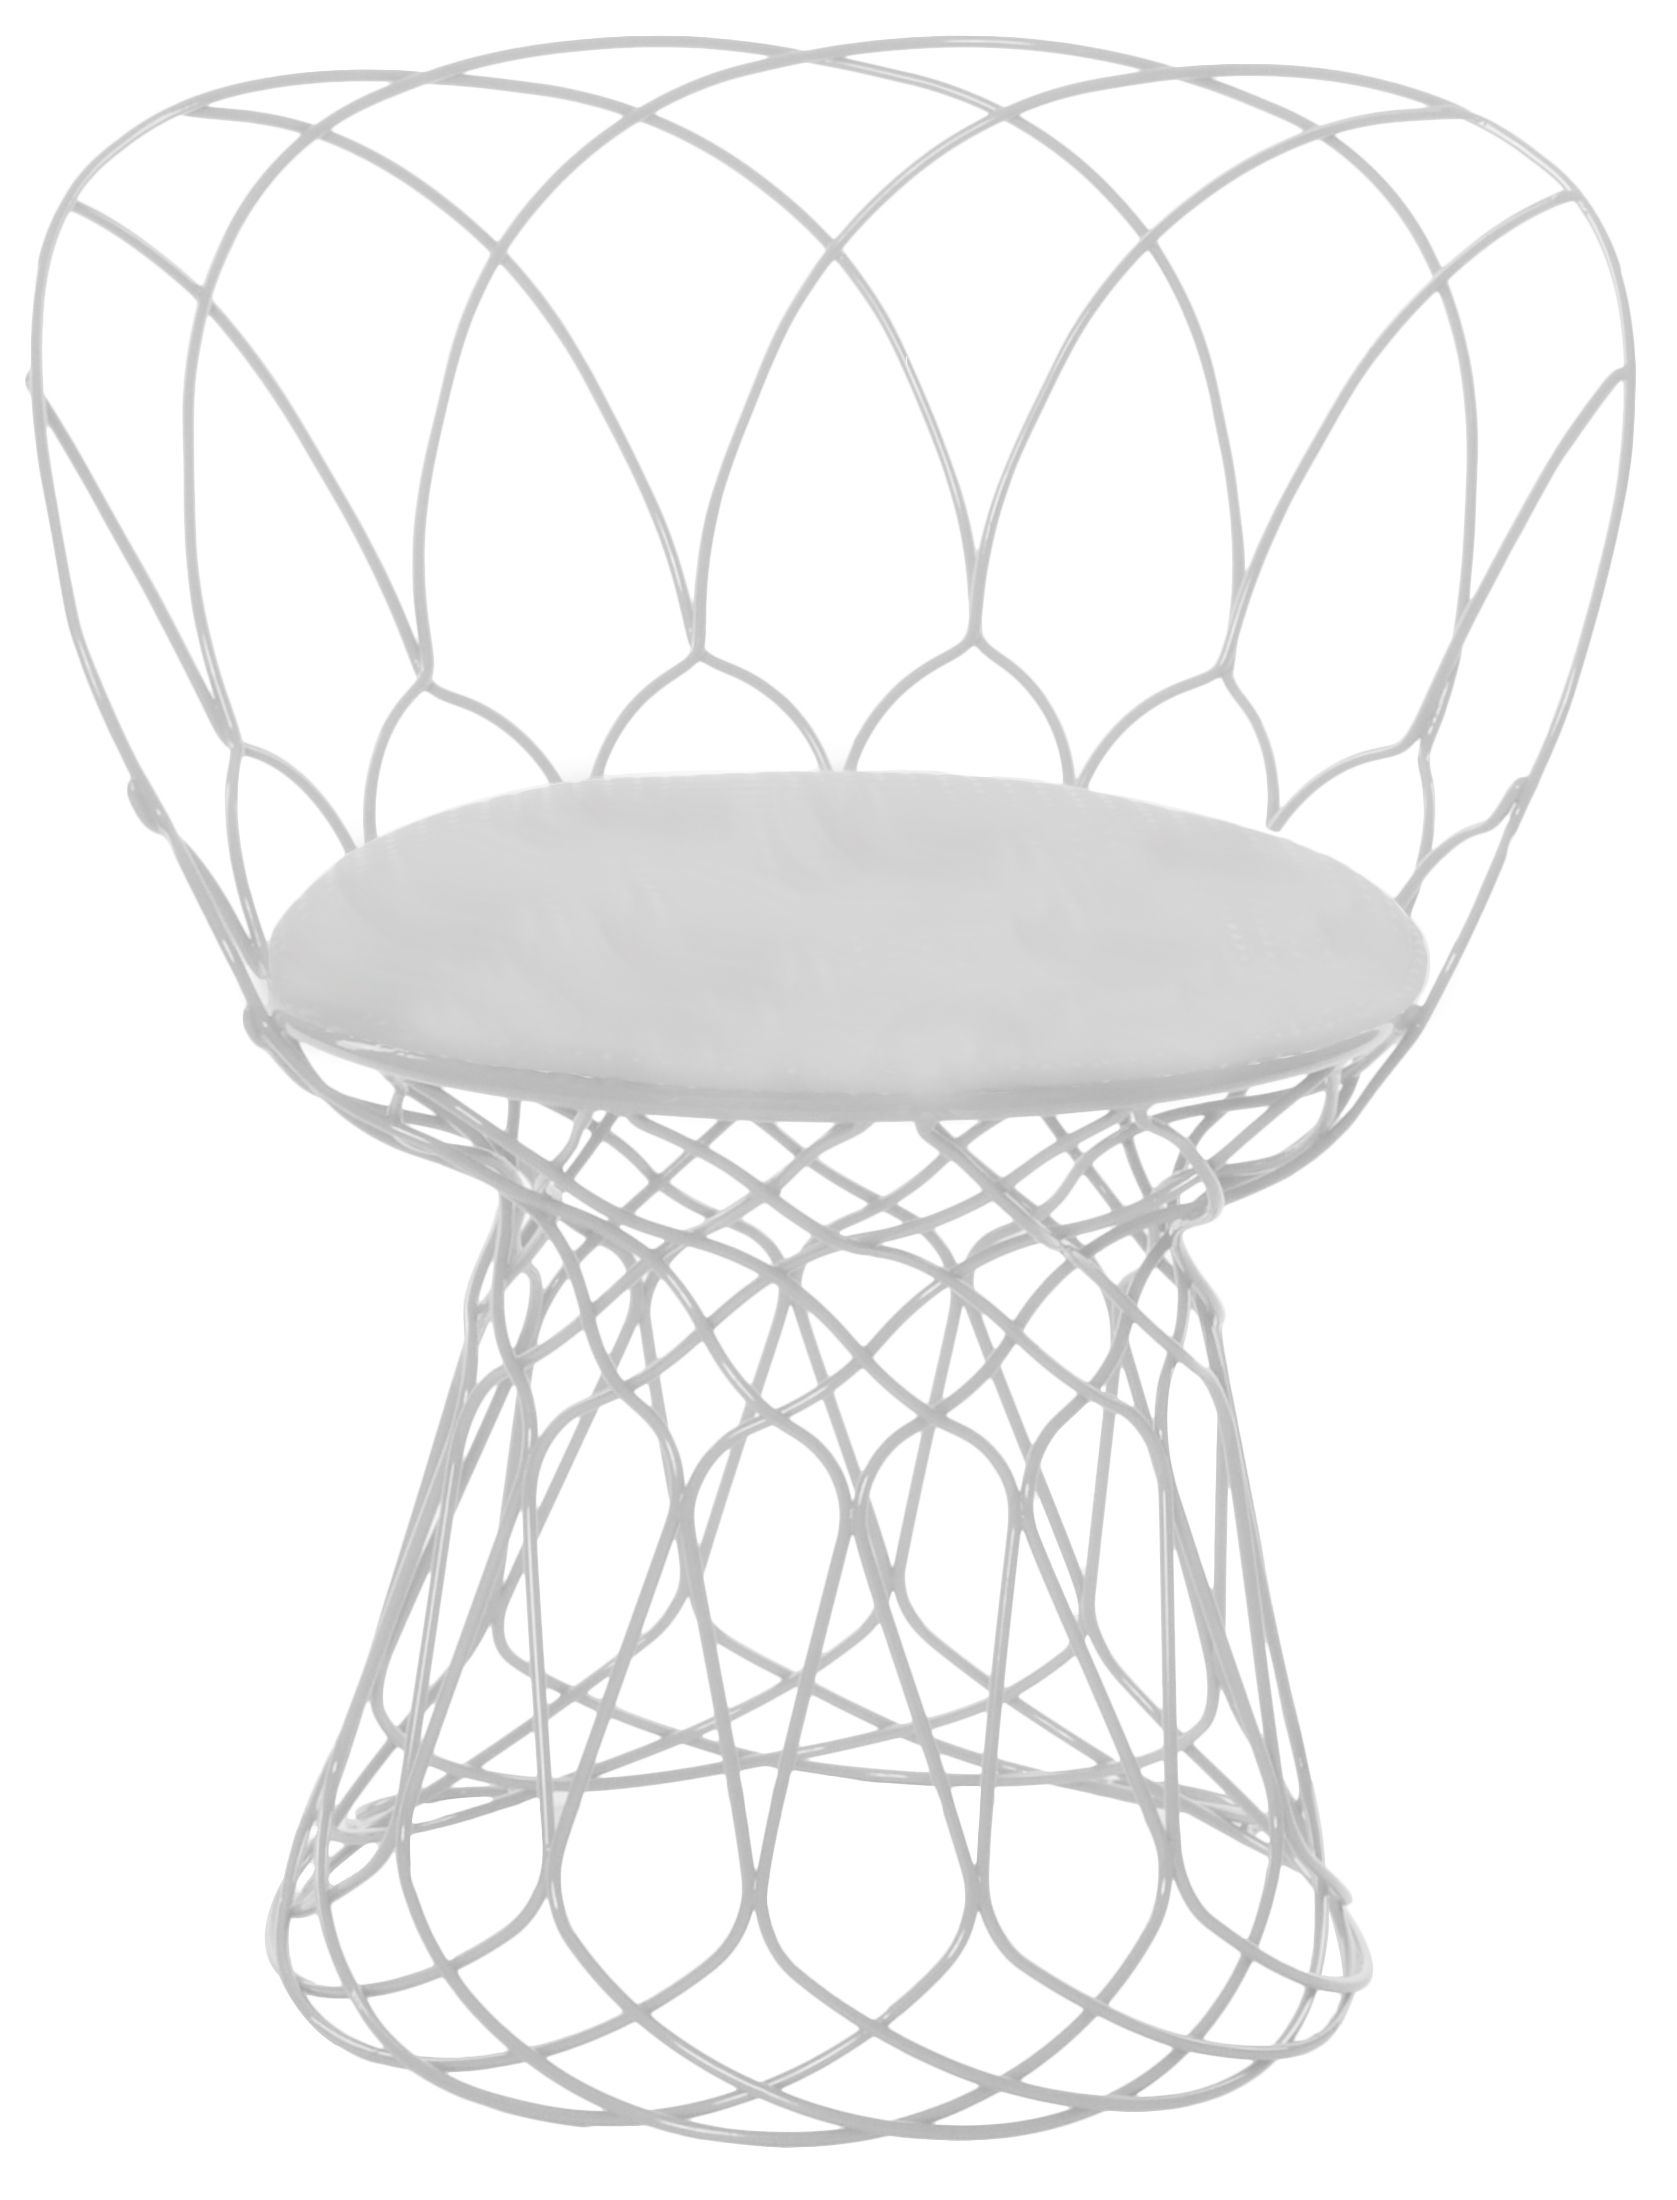 Interni - Cuscini  - Cuscino per seduta - Per poltrona e pouf Re-trouvé di Emu - Bianco tinta unita - Tessuto